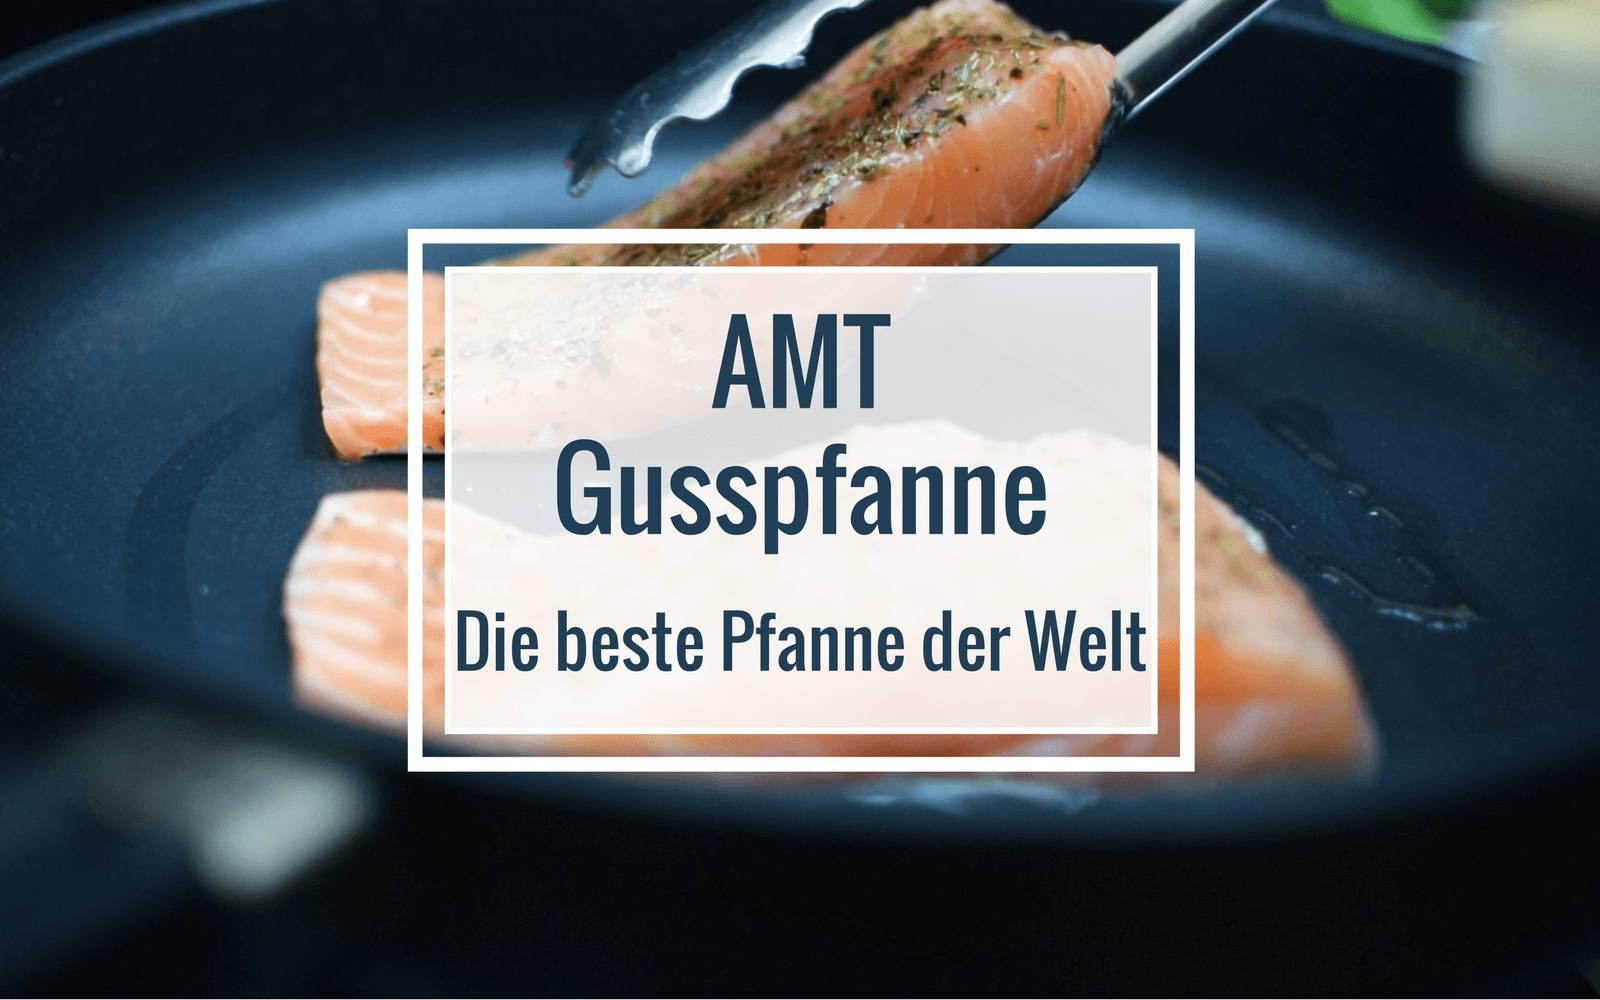 AMT Gusspfanne